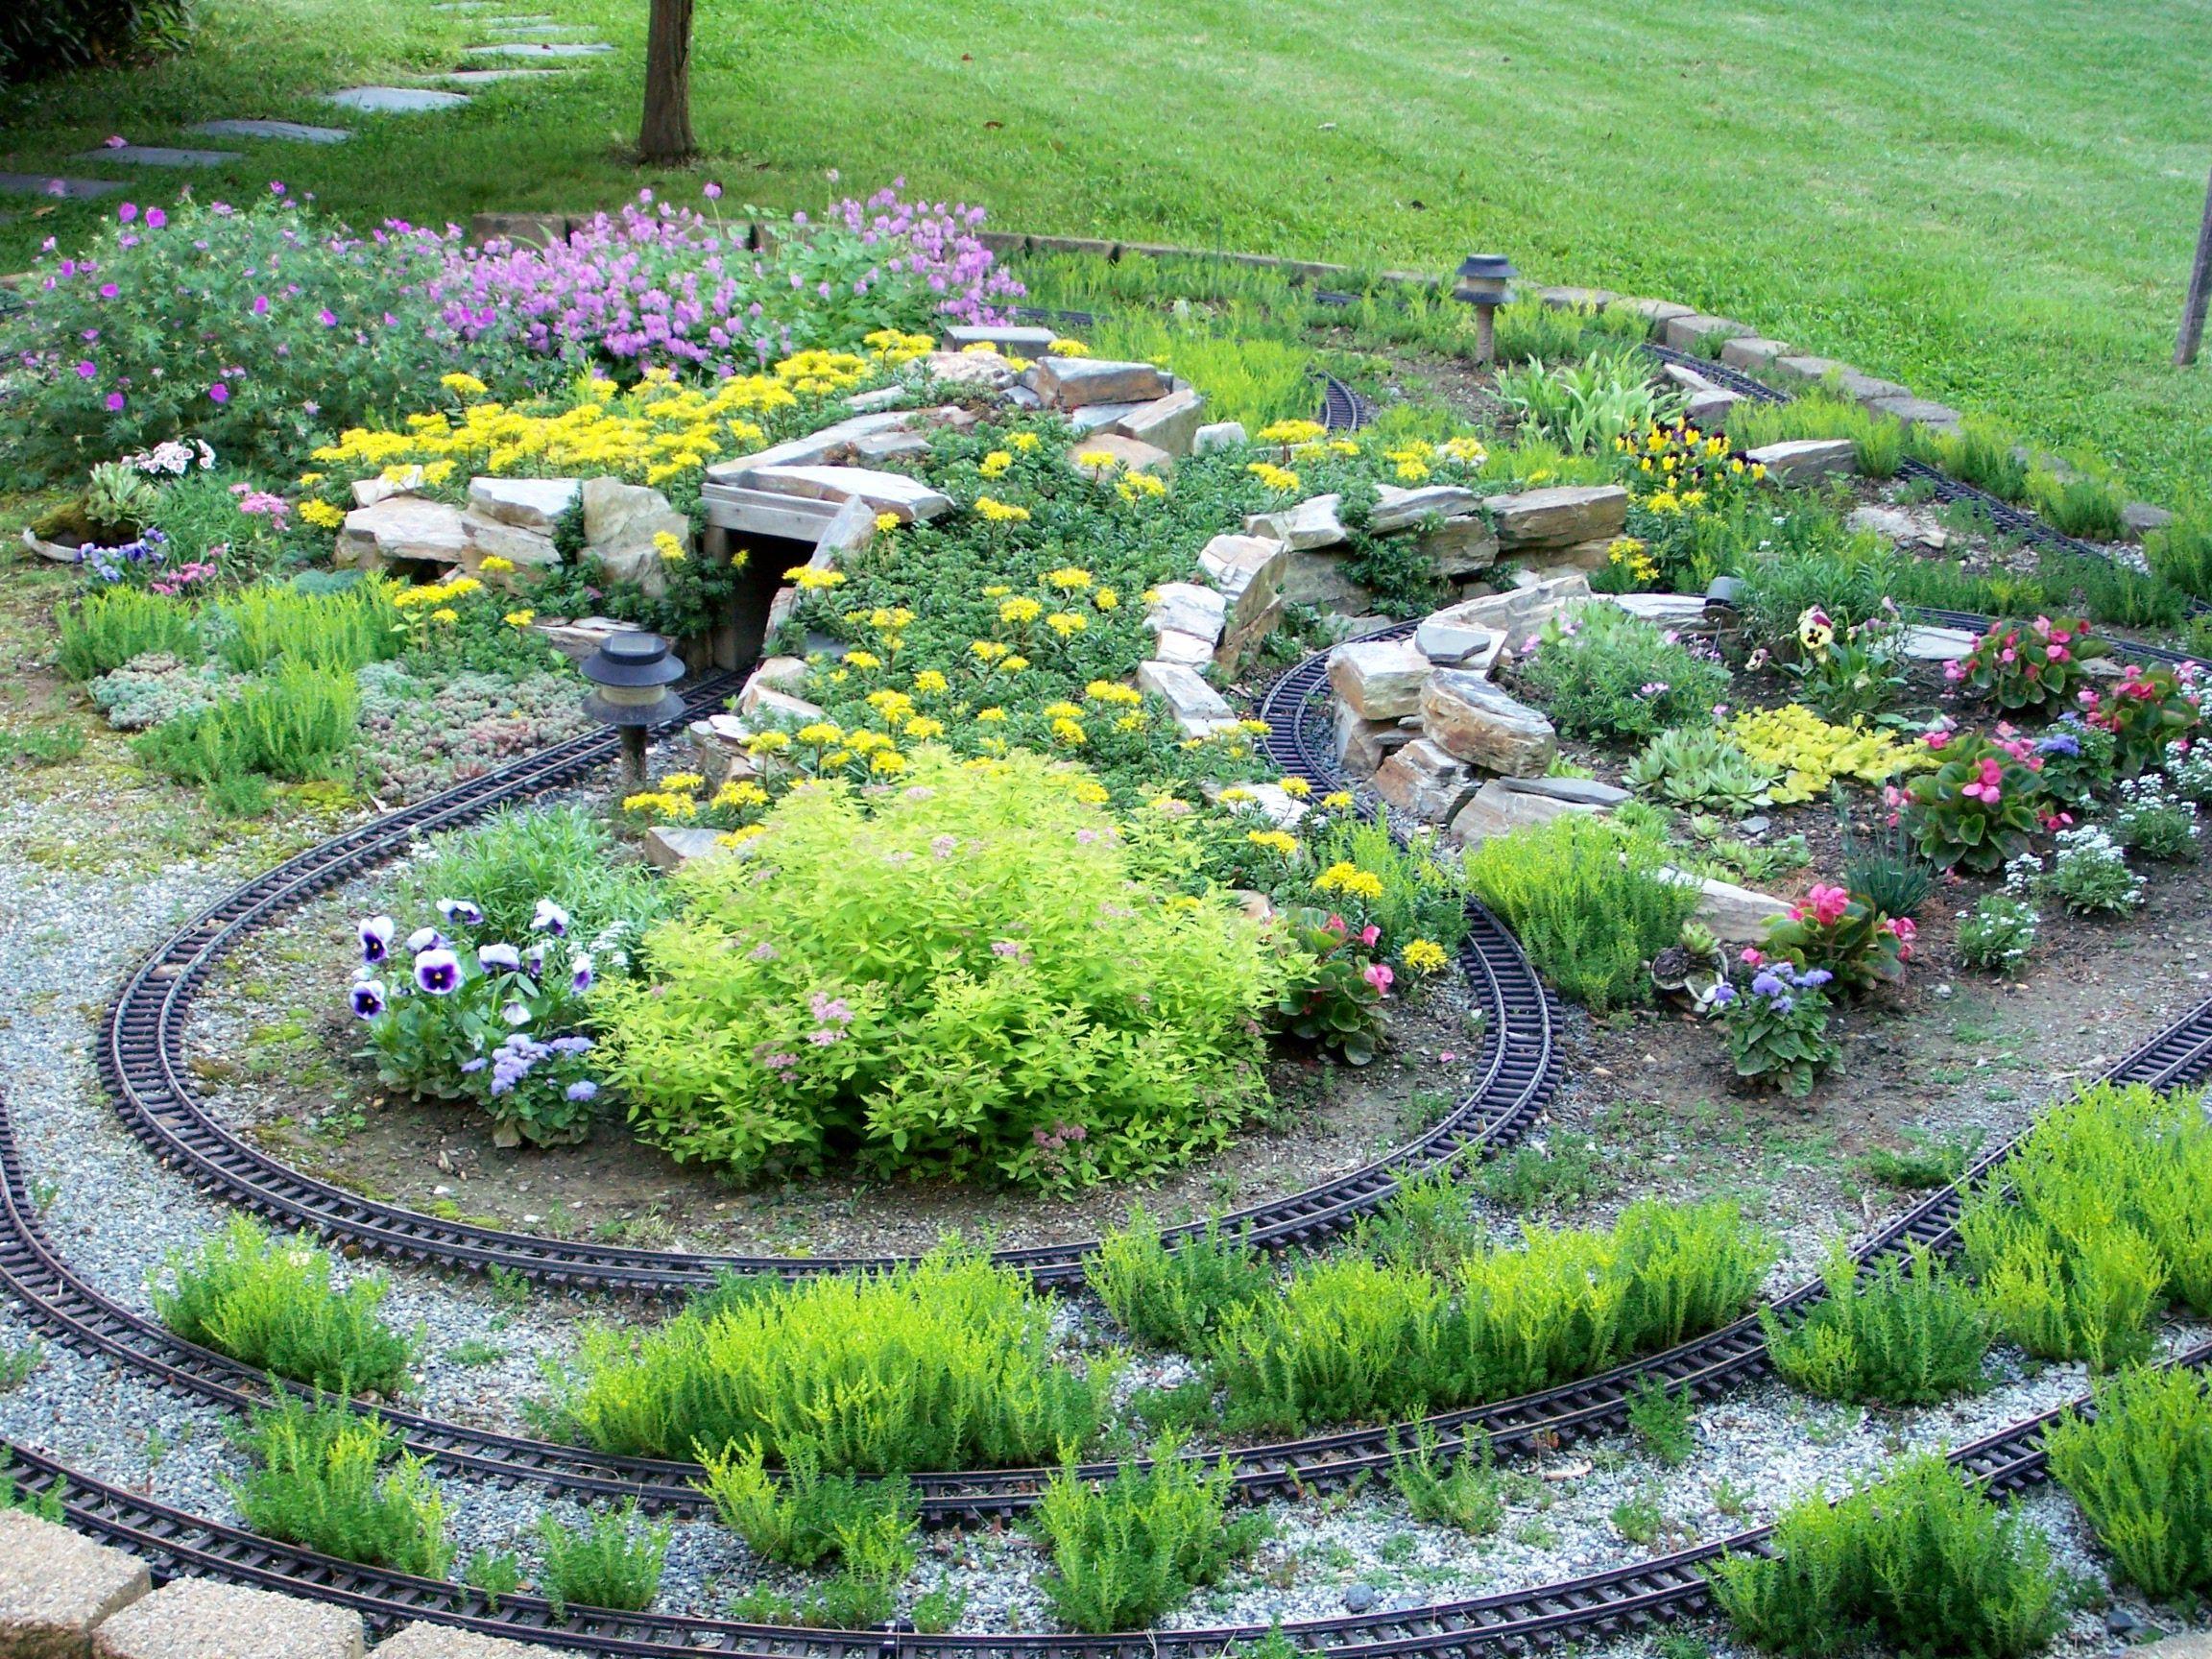 Outdoor train garden 2009 garden railroad pinterest for Garden railway designs